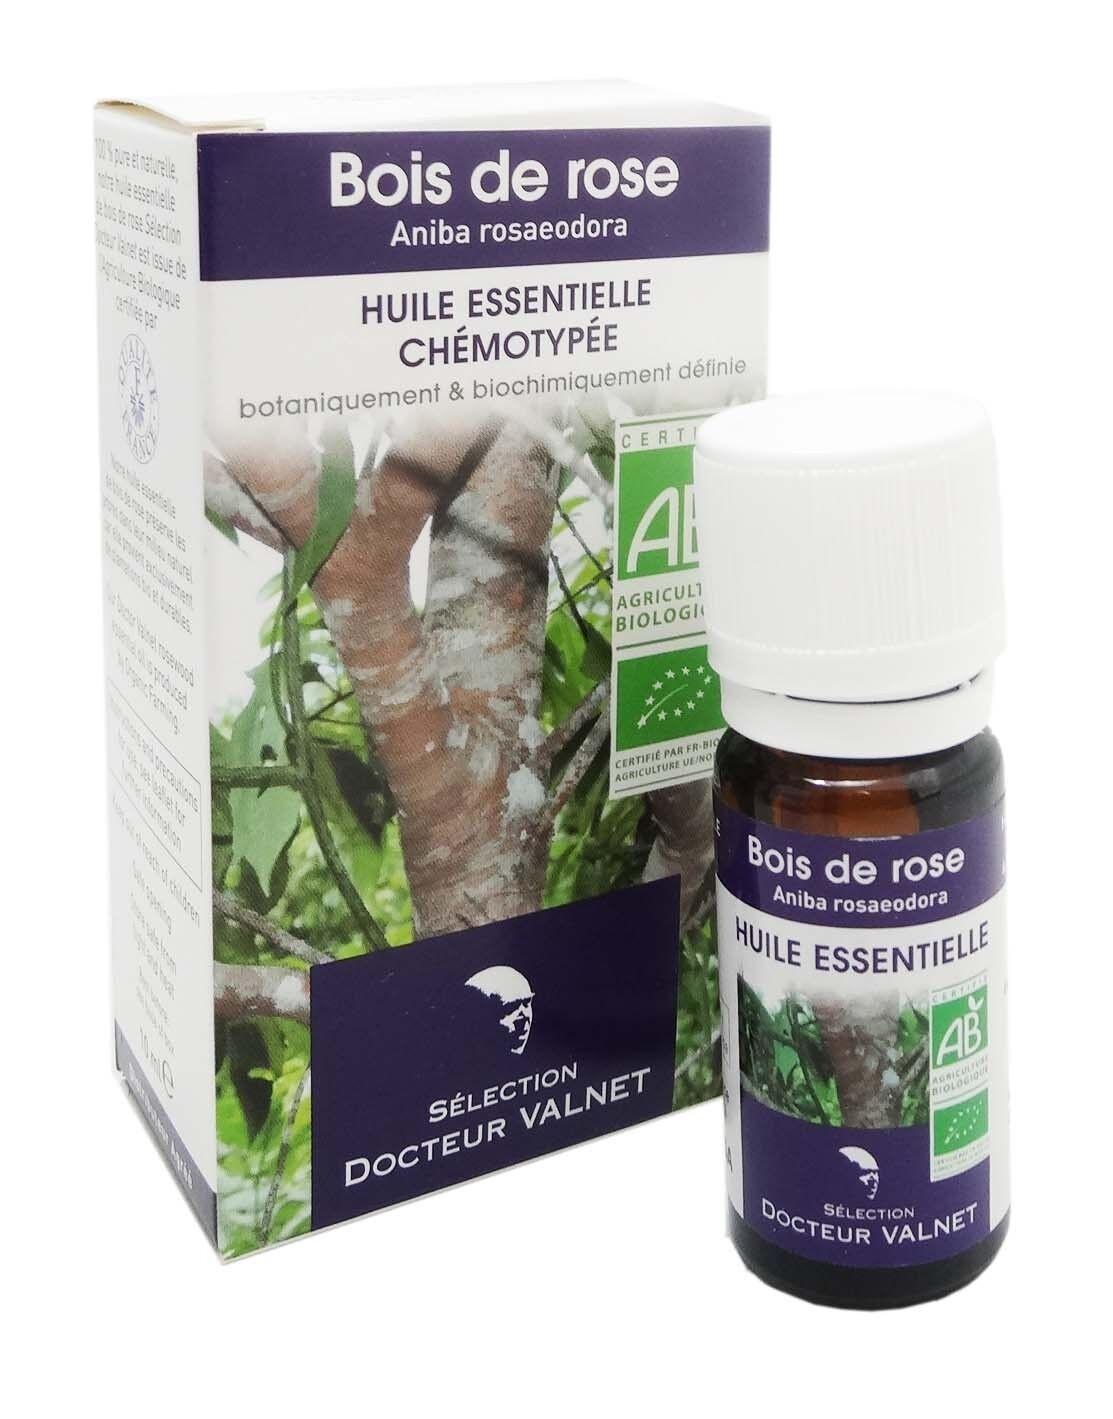 Docteur valnet huile essentielle chemotypee  bois de rose 10ml